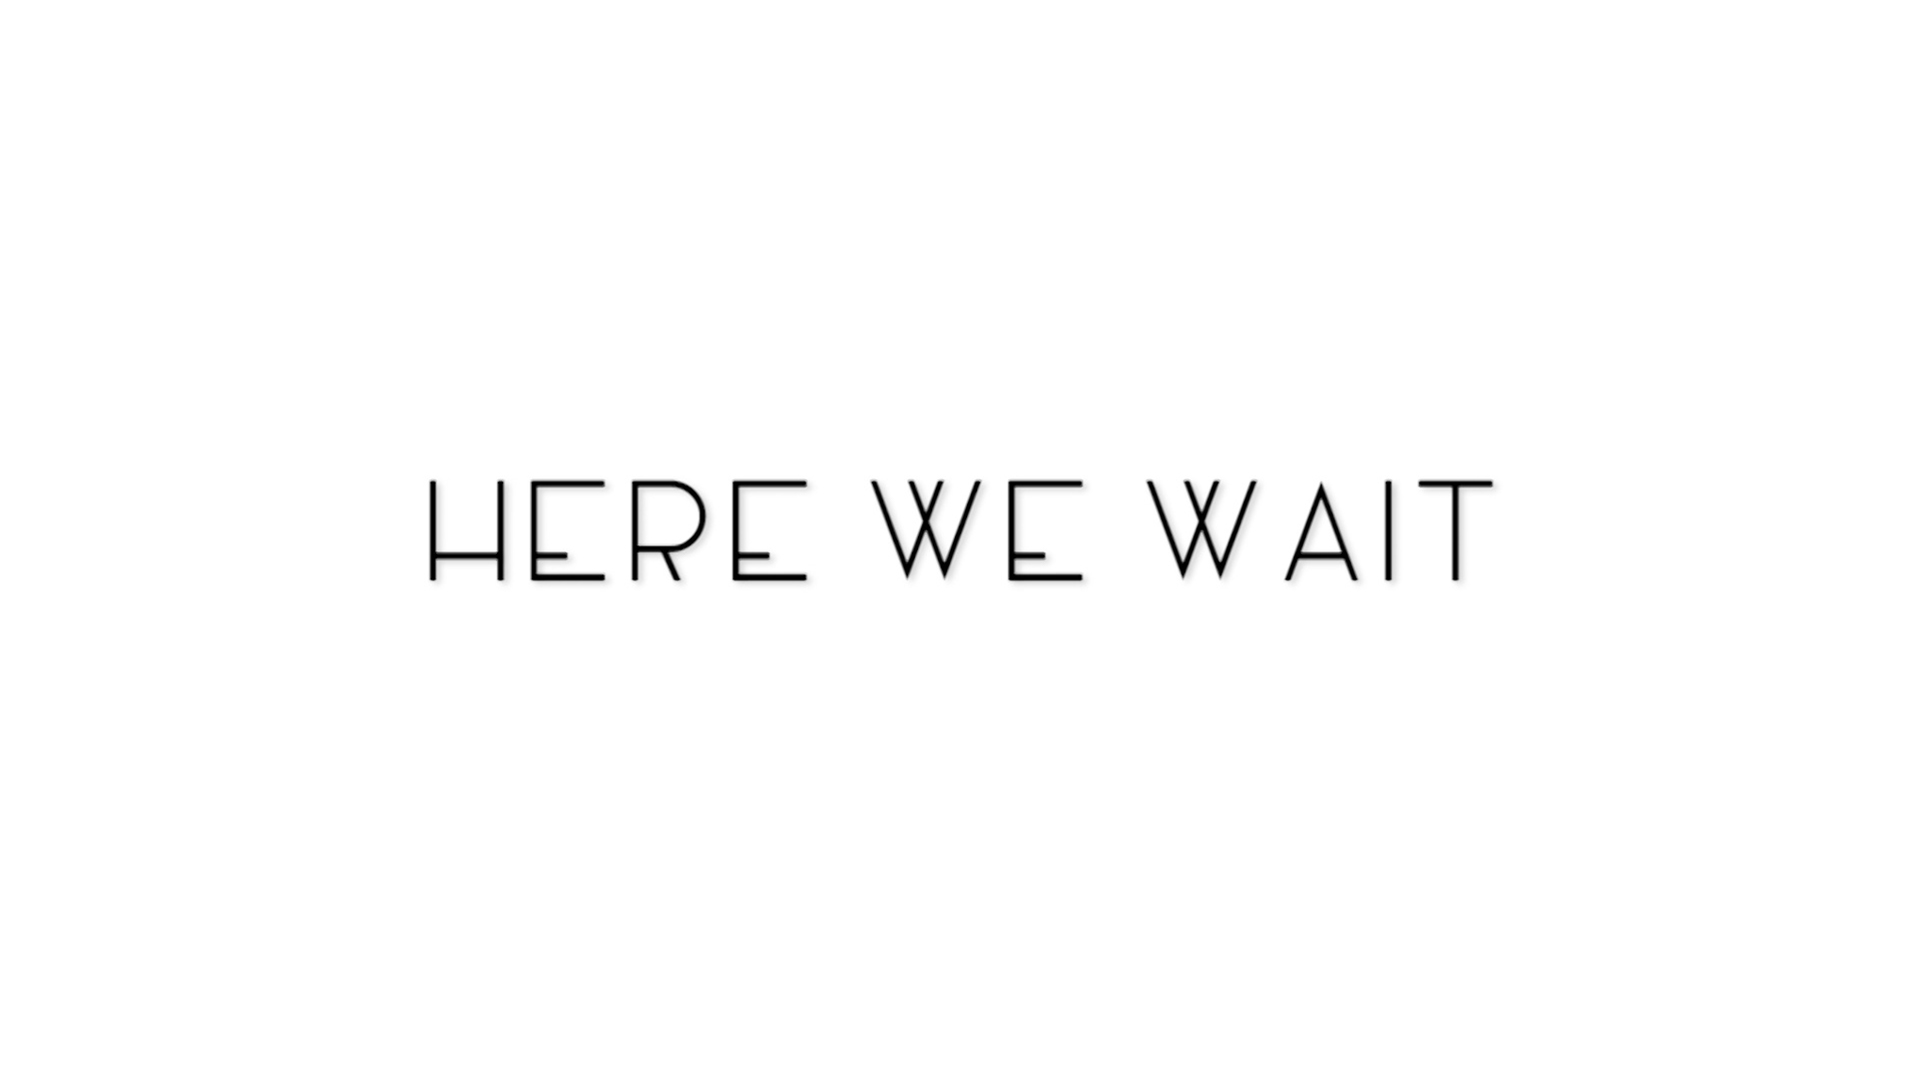 Here We Wait